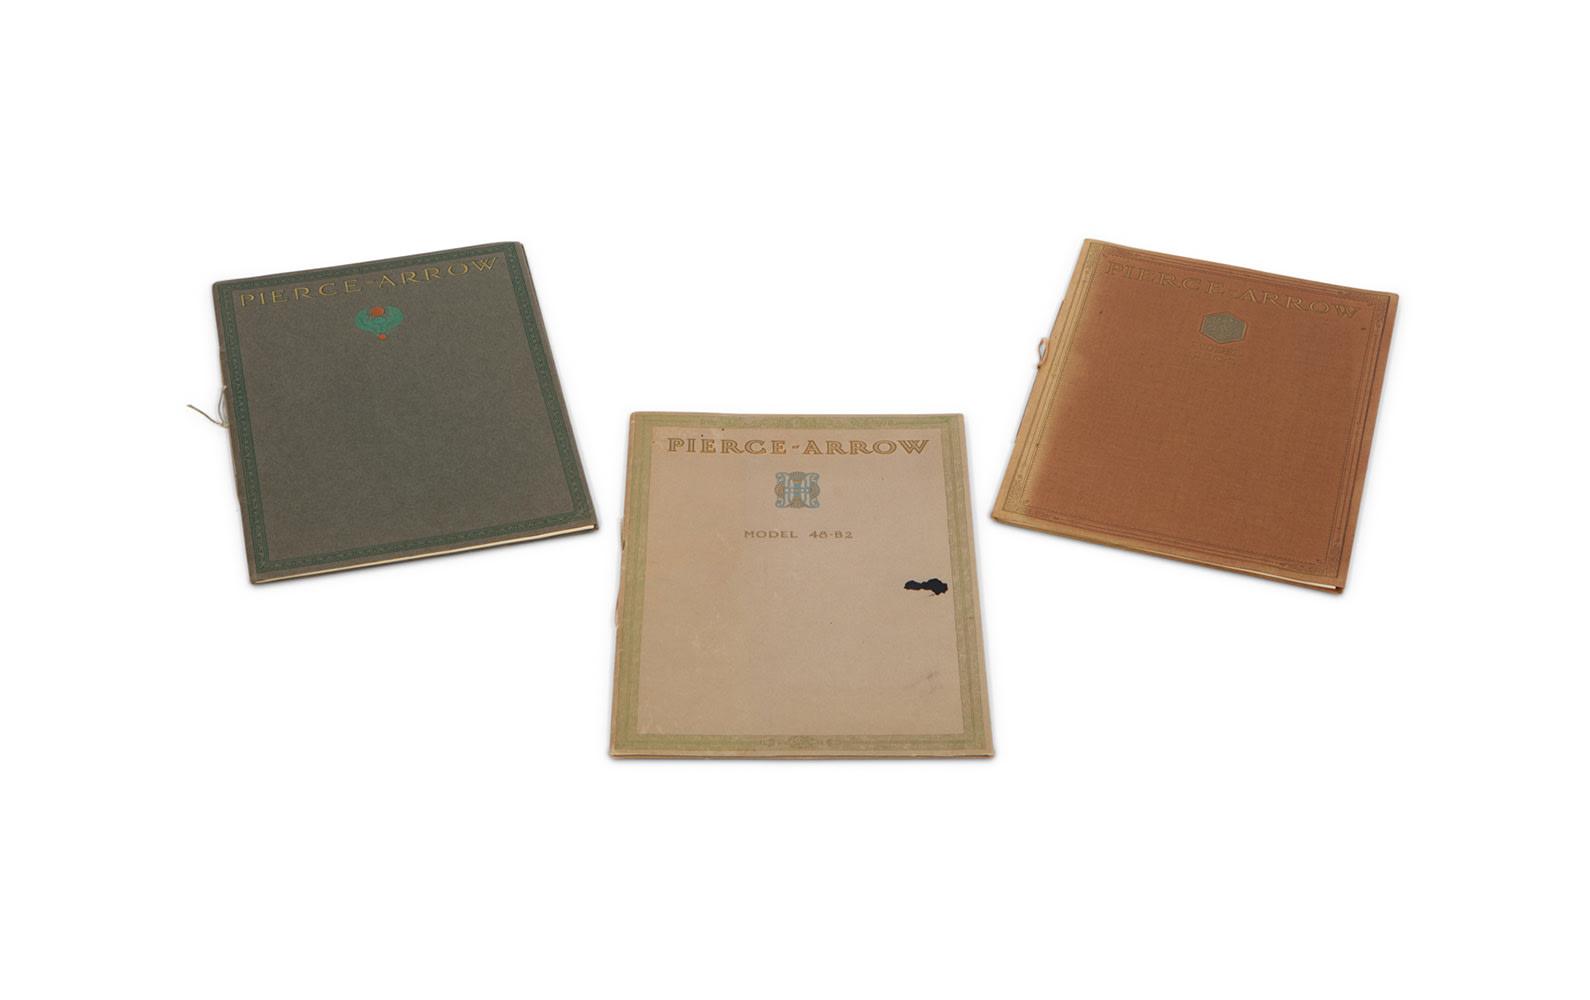 Pierce-Arrow Sales Brochures for Model 38 and Model 48, 1912–1914